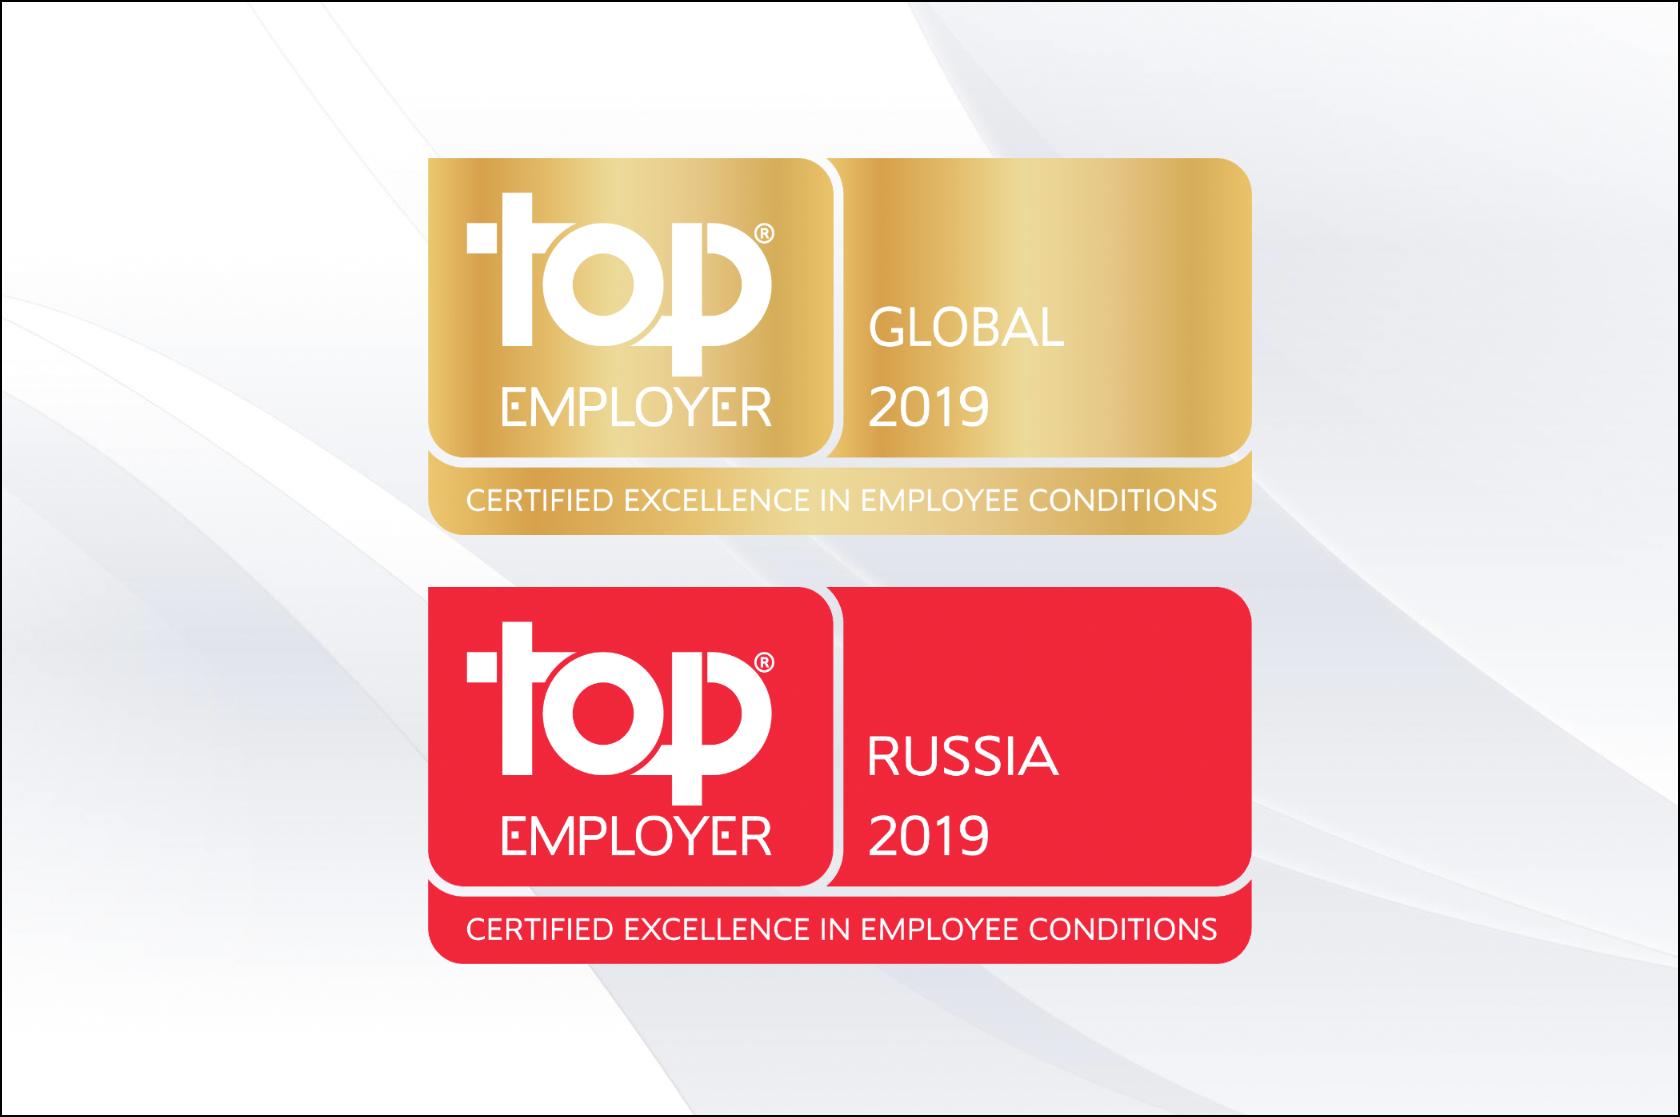 top employer institute certifie - HD1680×1117